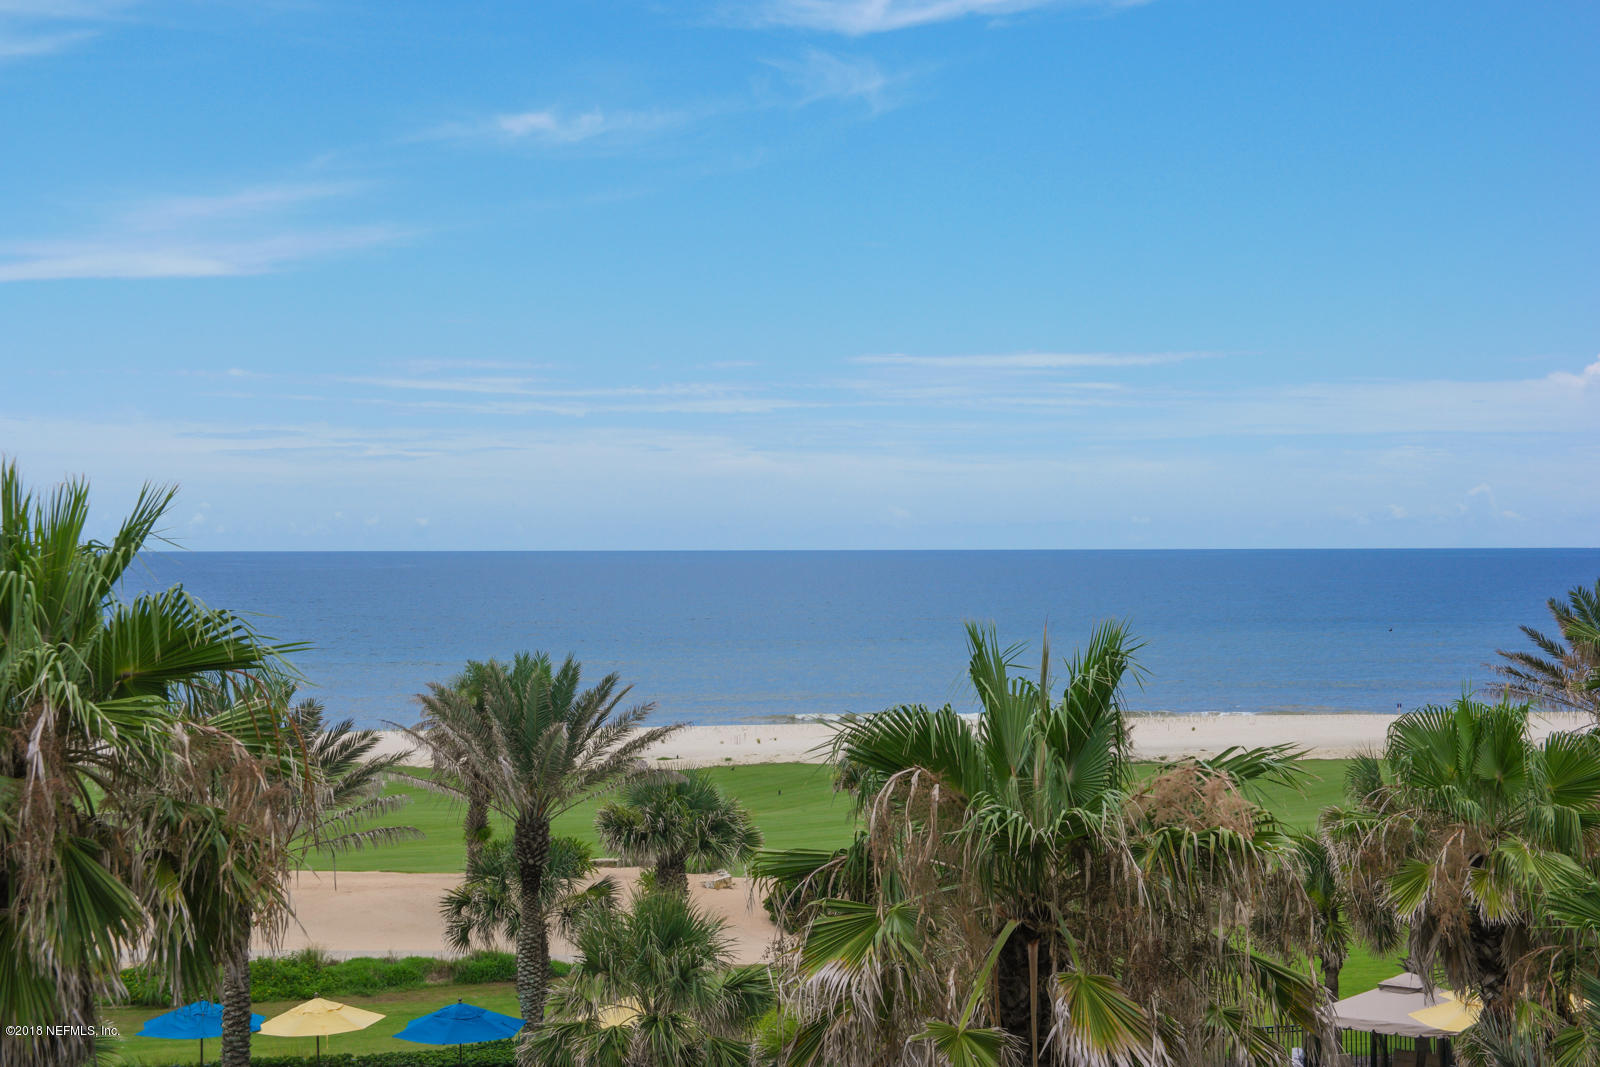 324 OCEAN CREST, PALM COAST, FLORIDA 32137, ,Vacant land,For sale,OCEAN CREST,897885